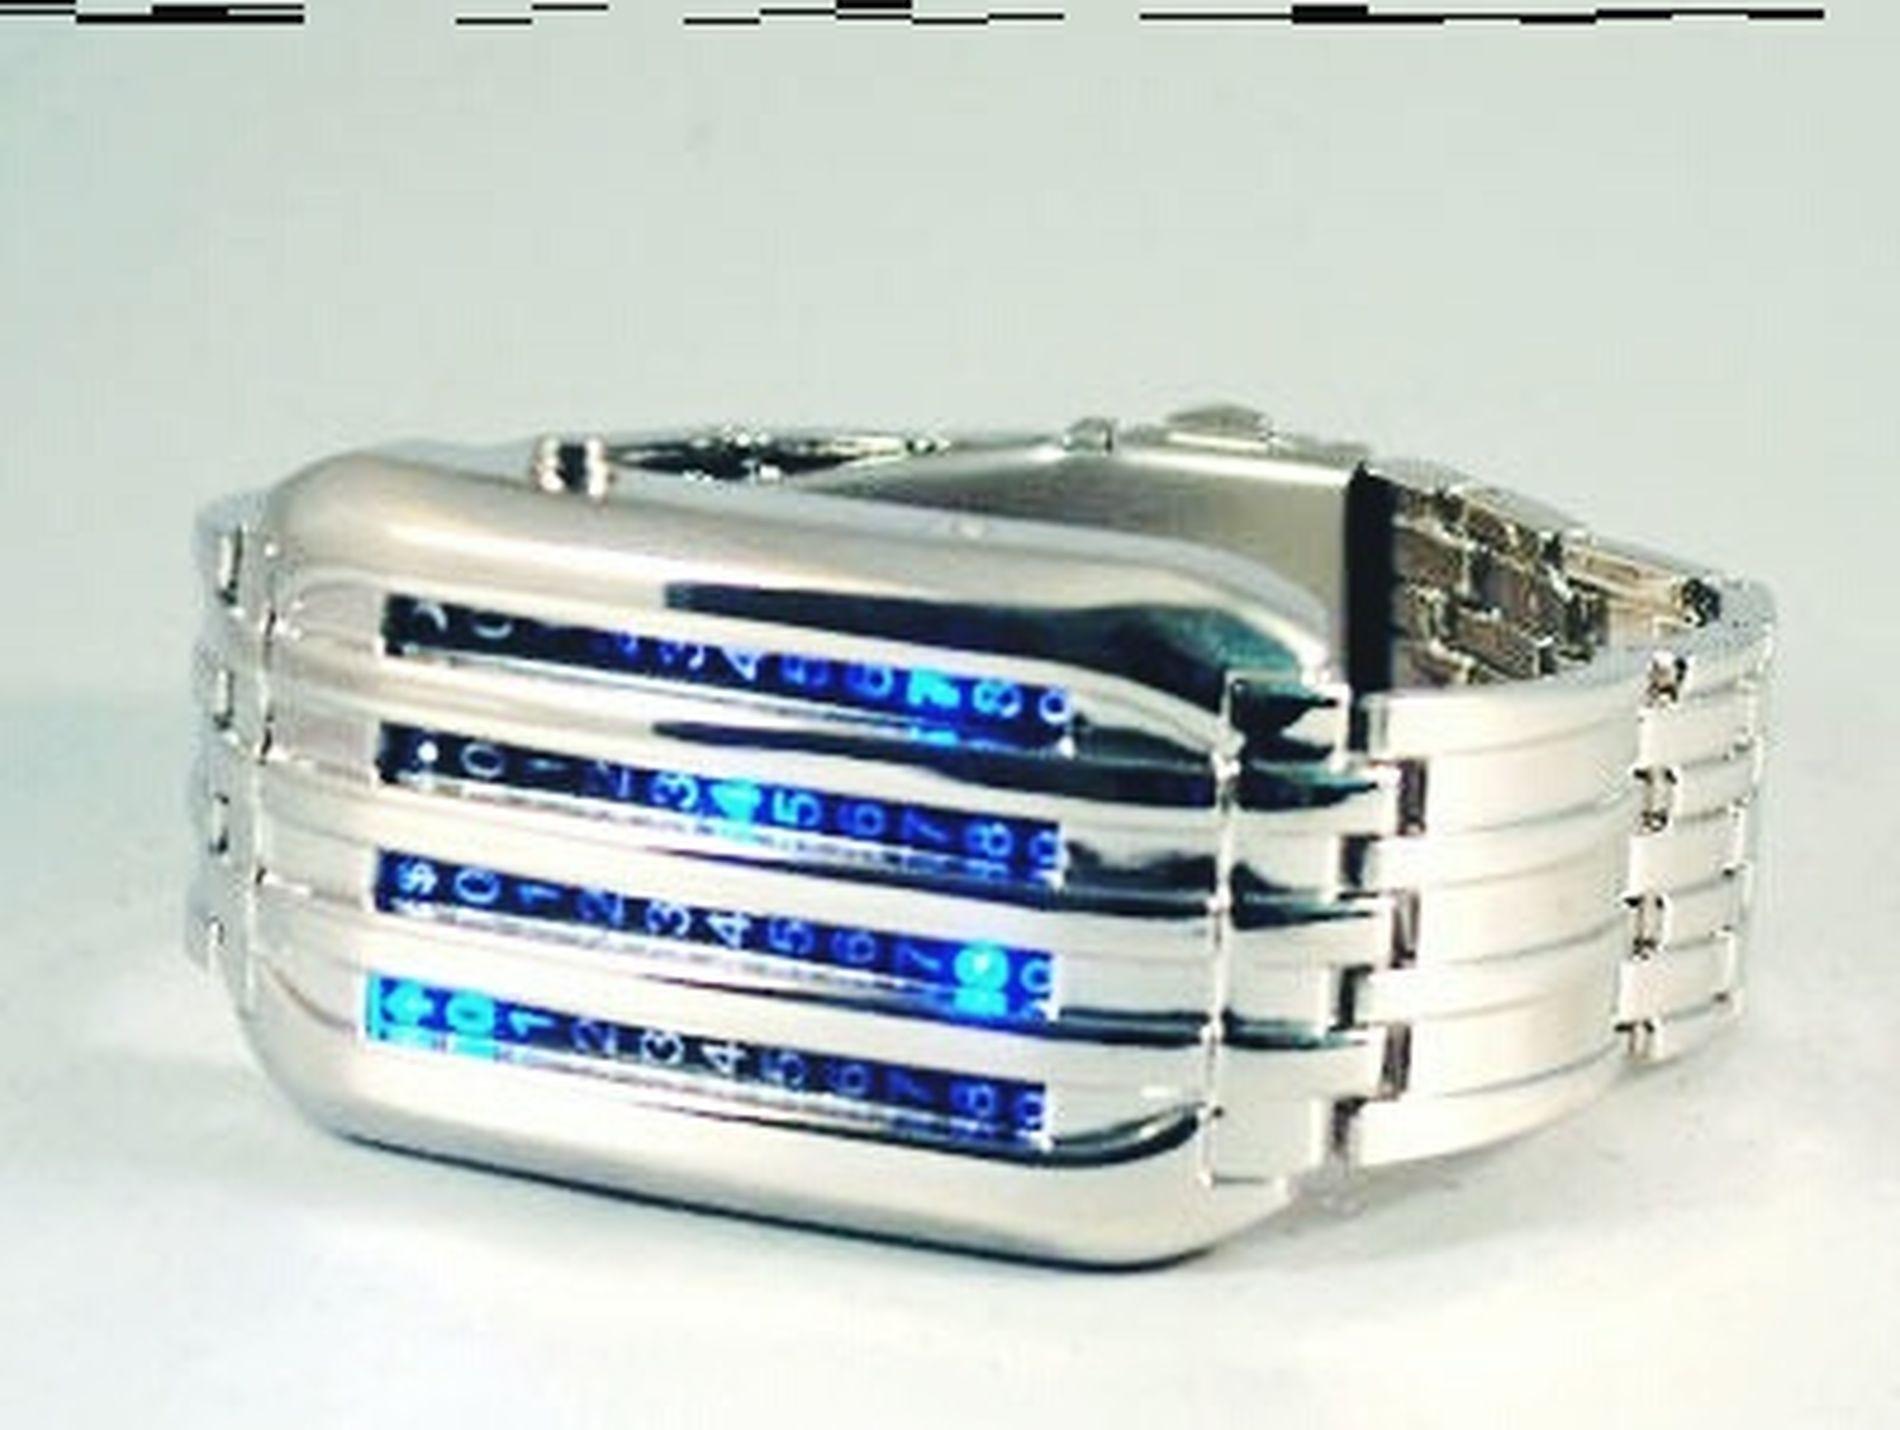 www.slick91.com LED Watch Menswear Jewelry Menstyle Wristwatch Unique My Unique Style Watches LedWatch